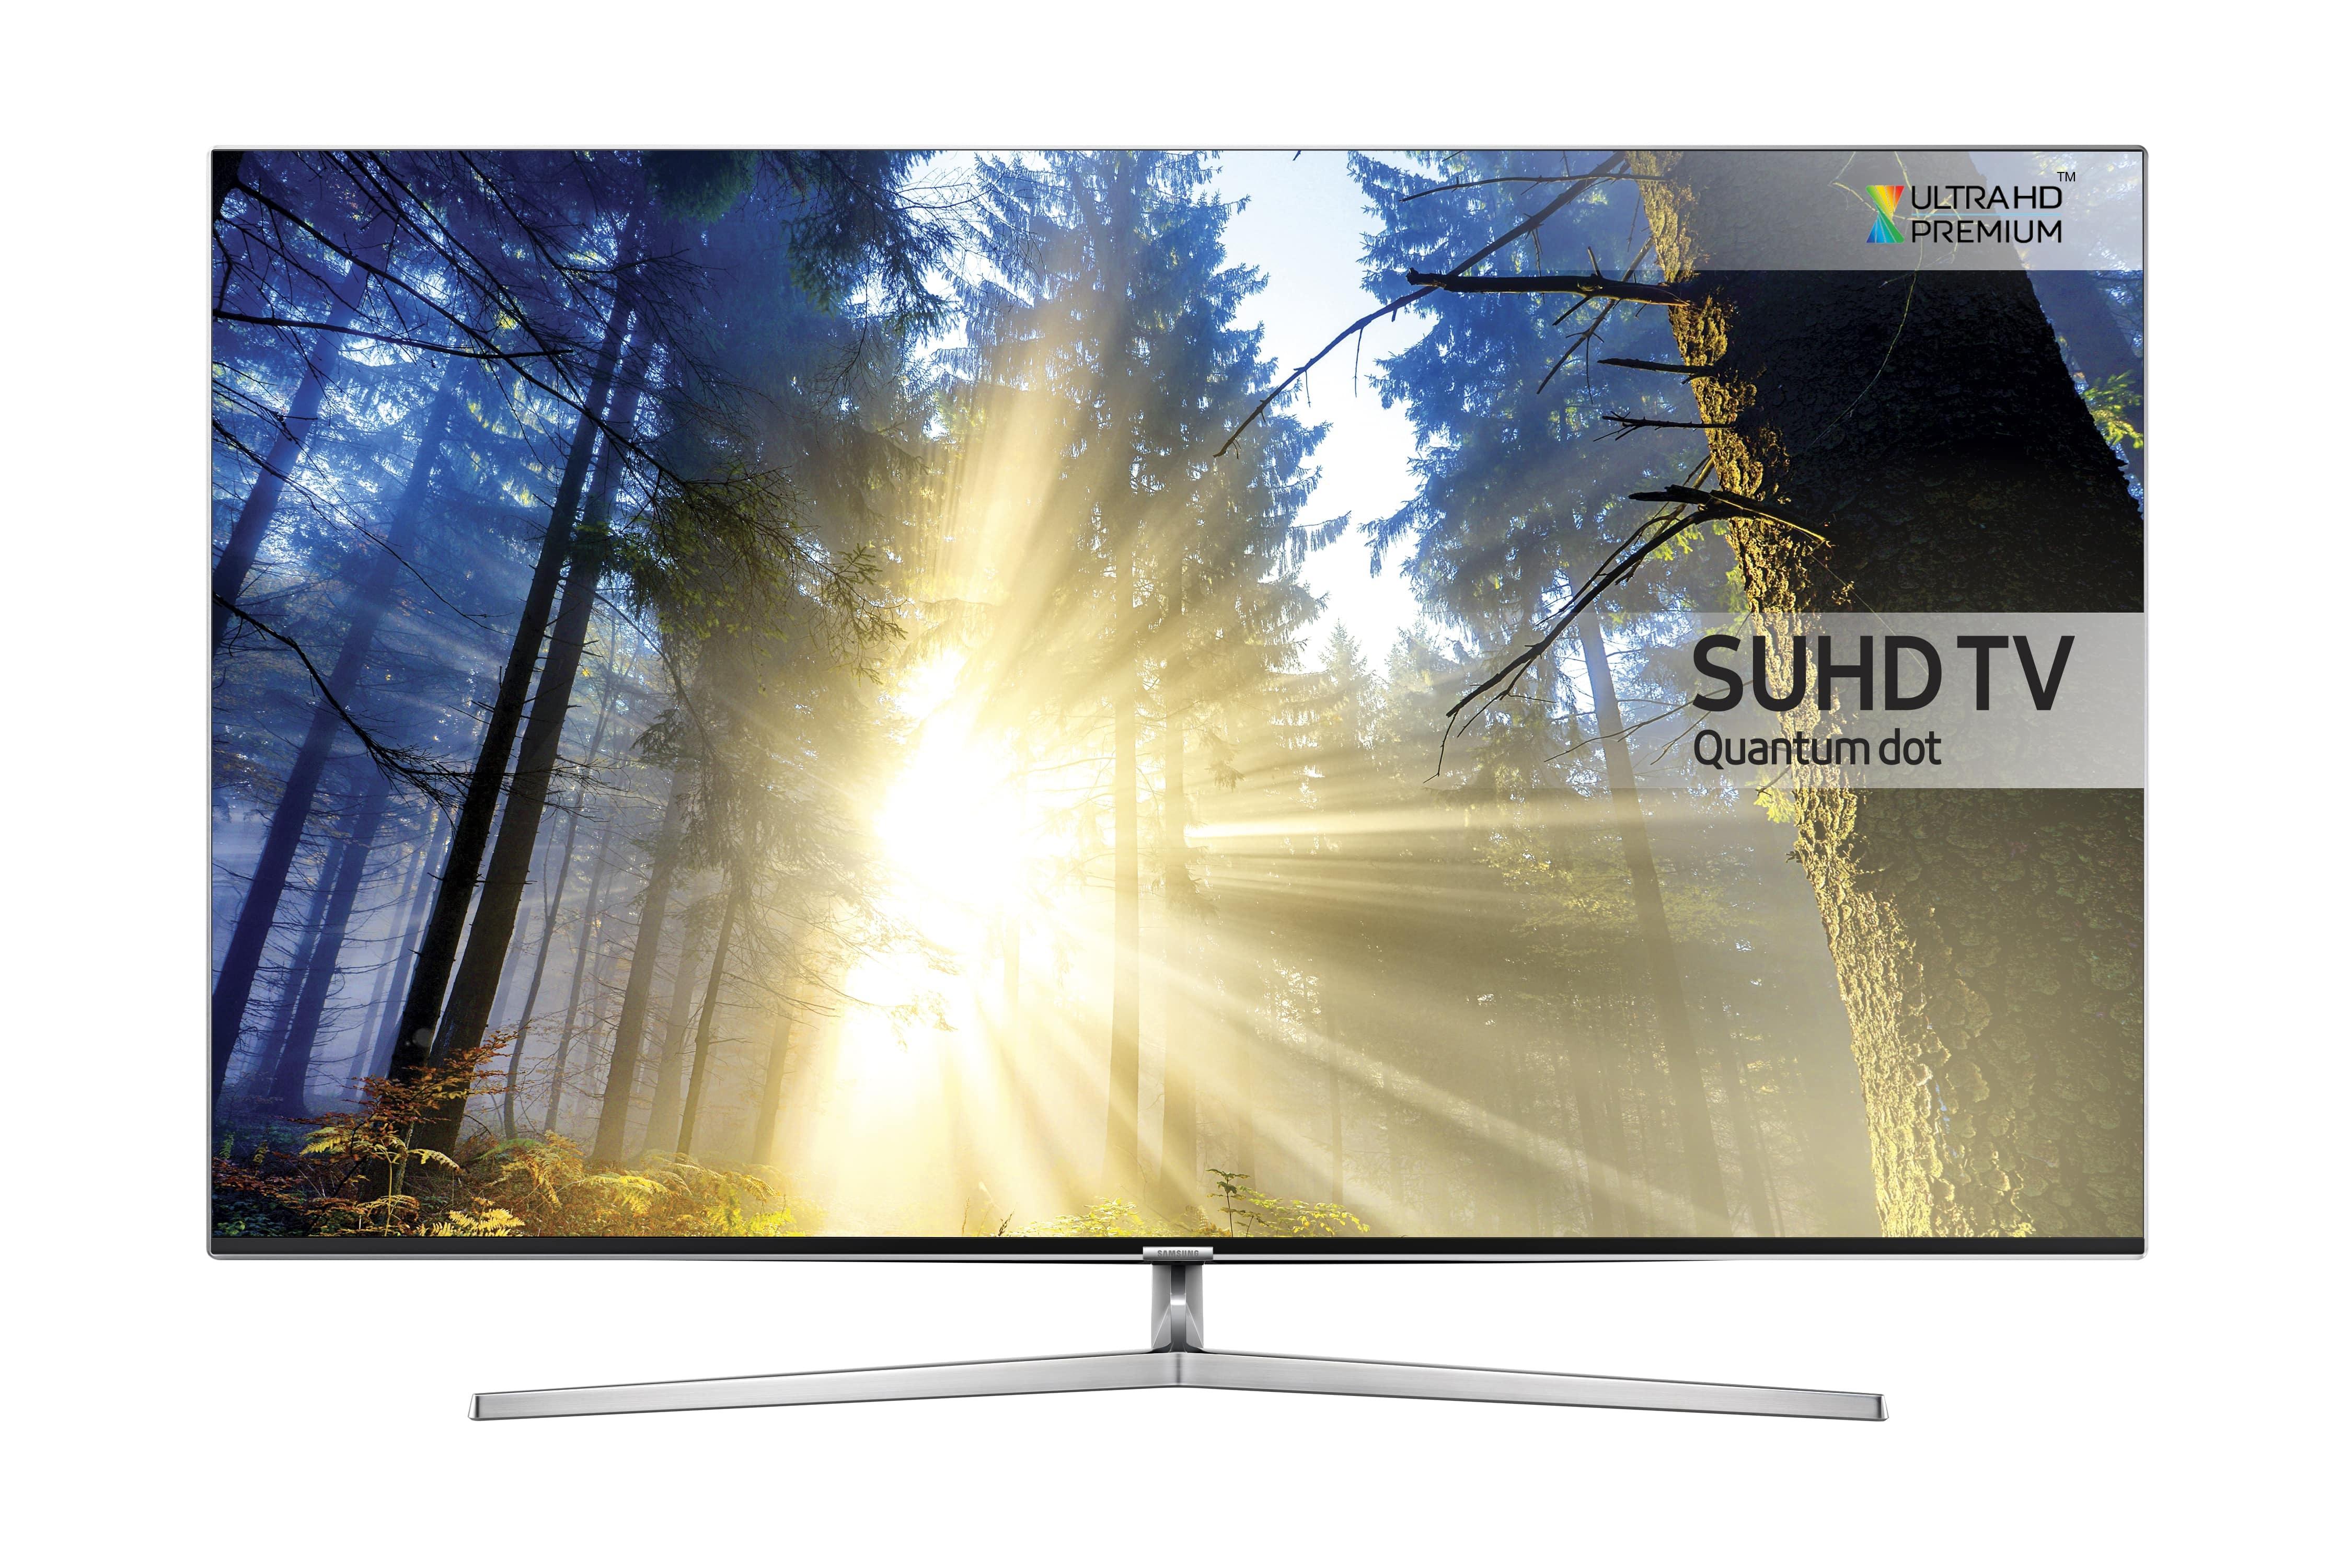 8-Series Quantum Dot SUHD TV UE55KS8000